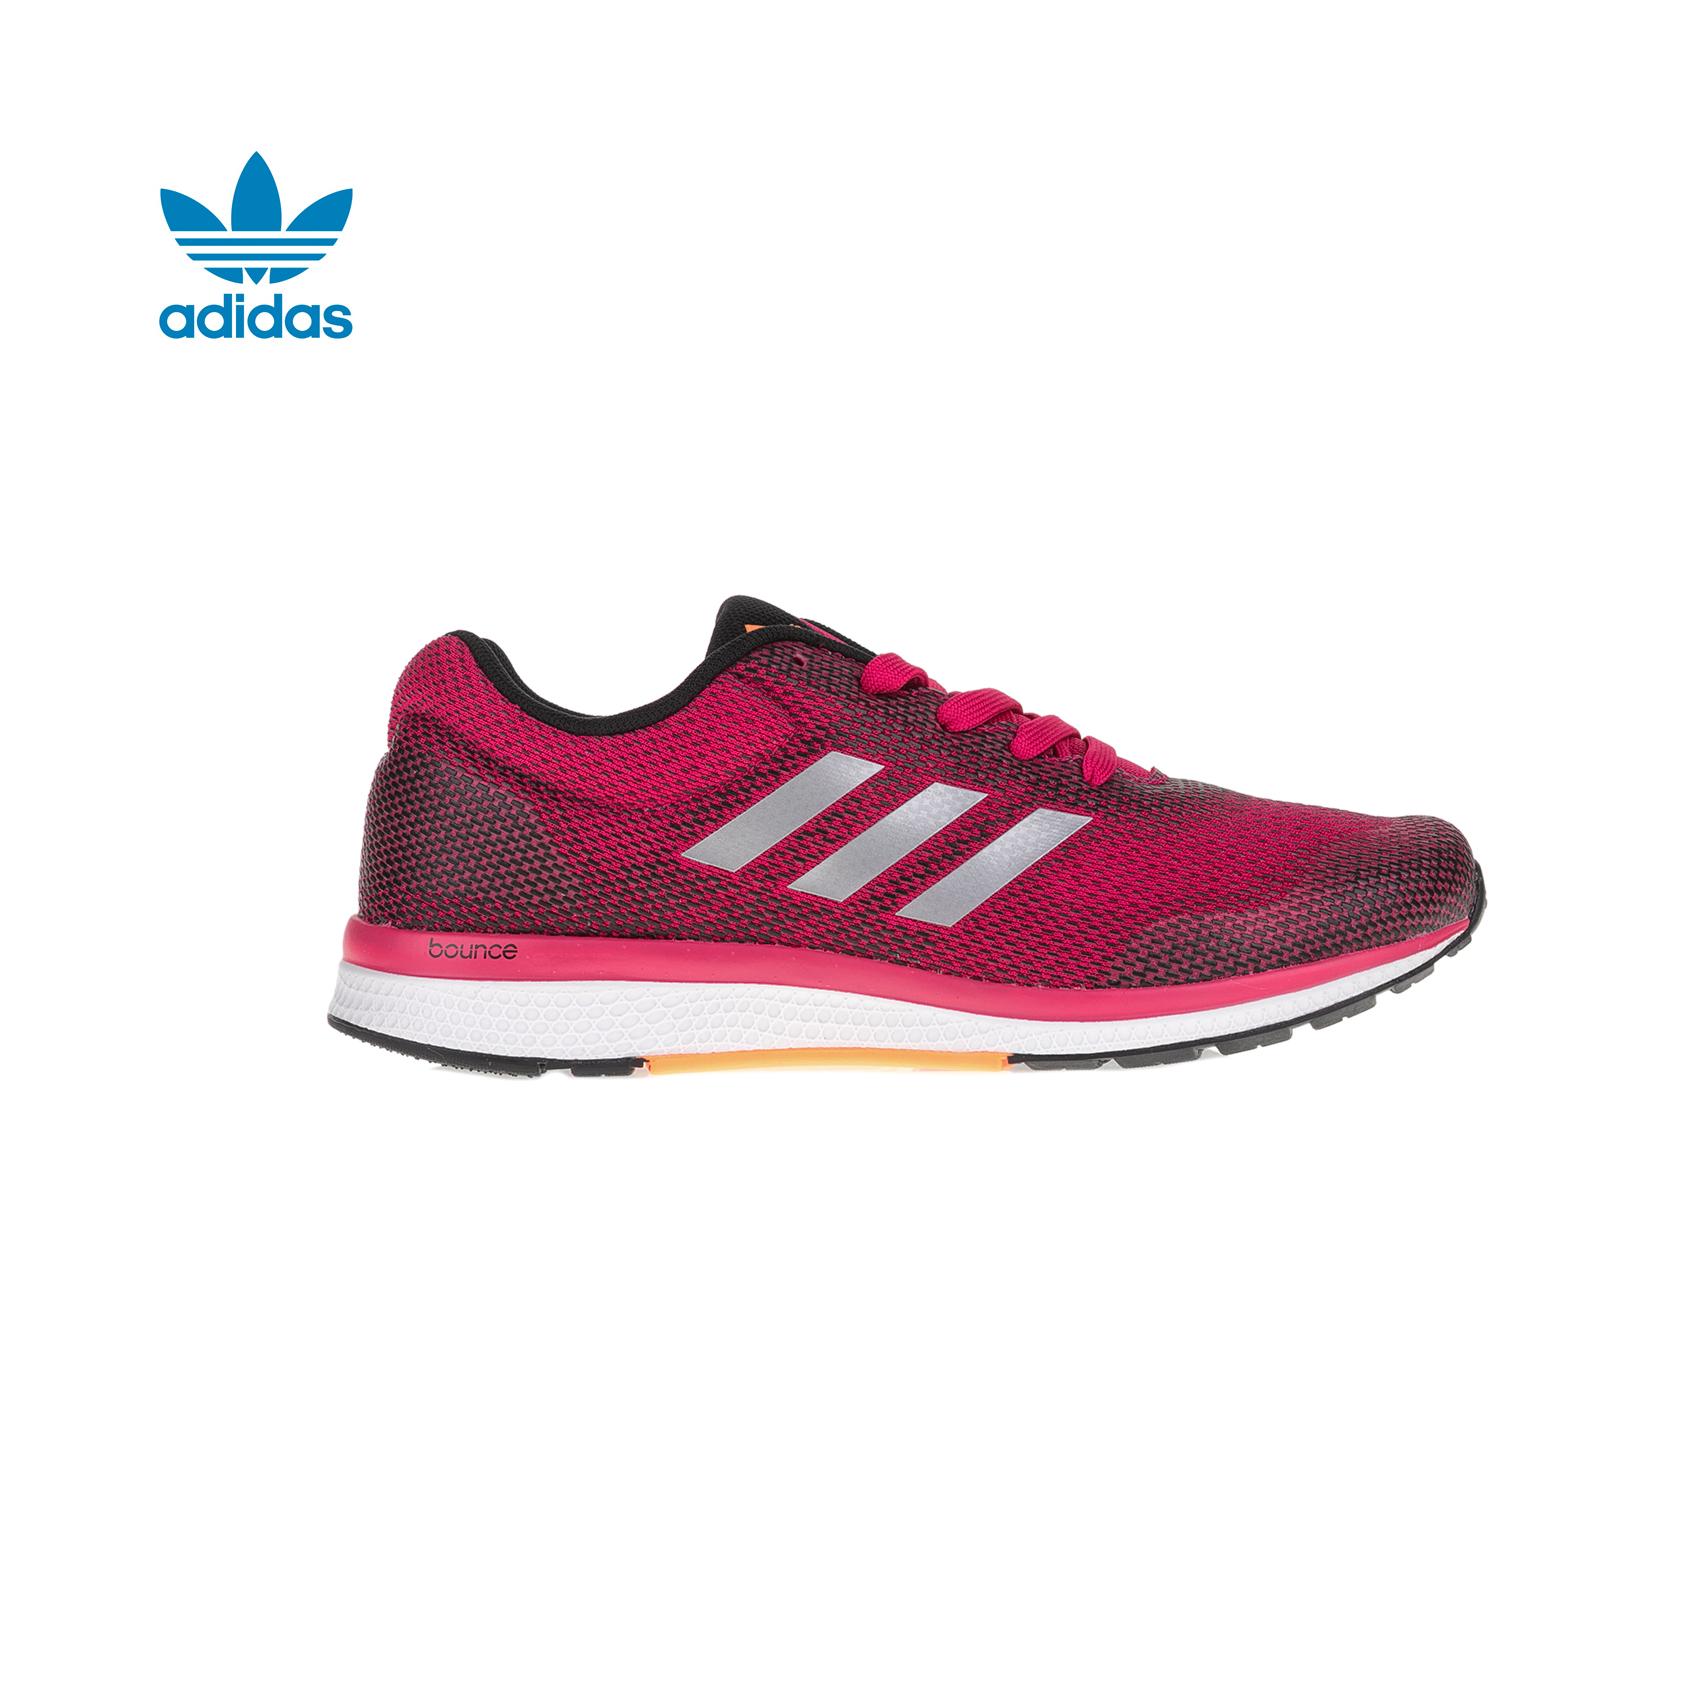 adidas Originals – Γυναικεία παπούτσια adidas mana bounce 2 aramis κόκκινα